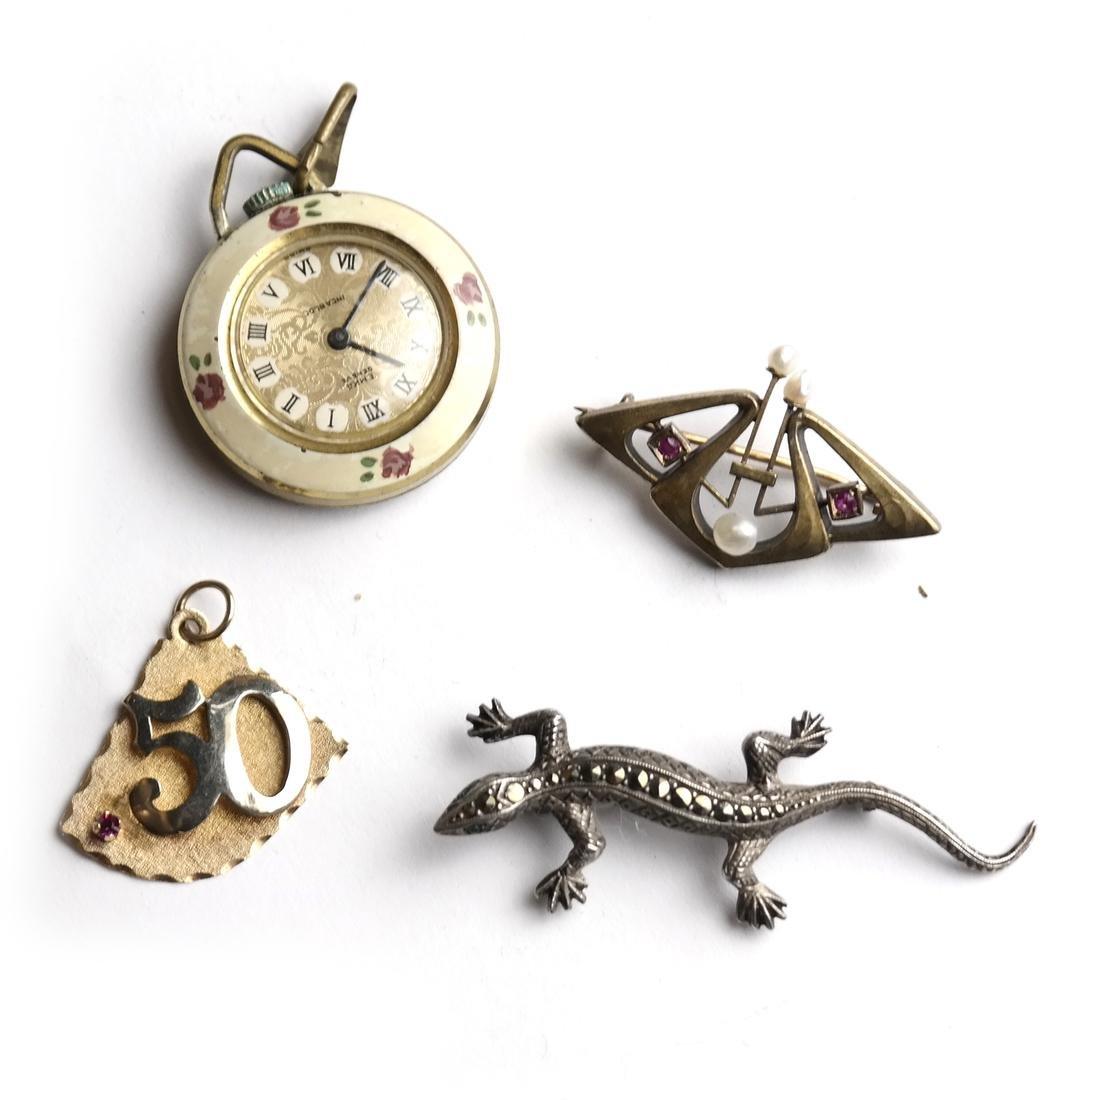 4 Items: Pin, Brooch, Watch, Lizard